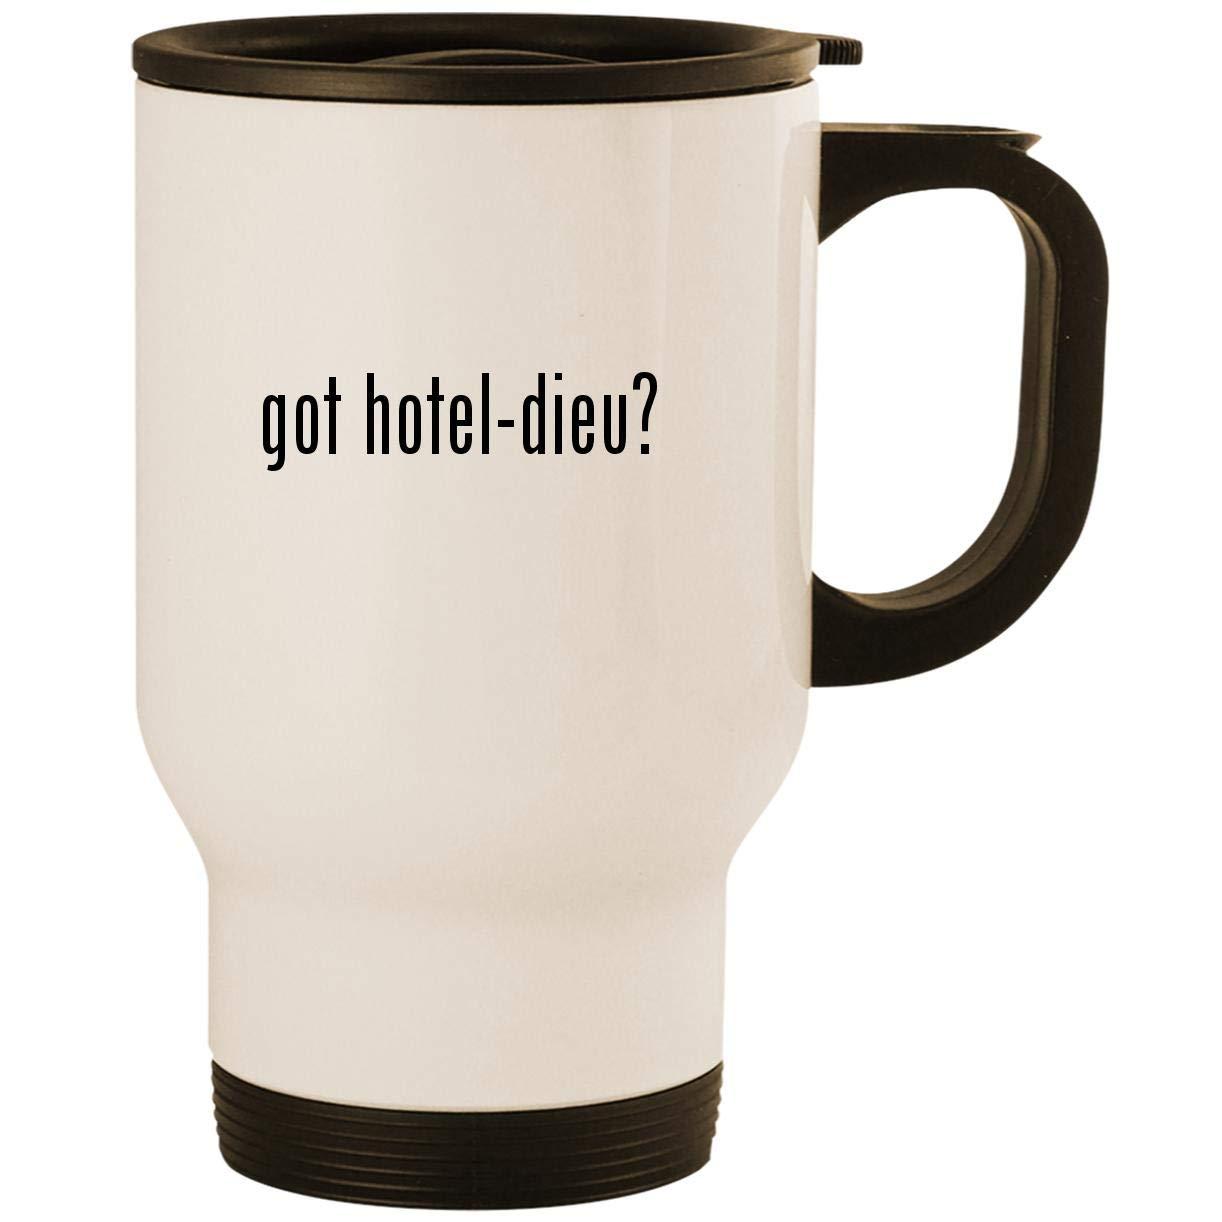 got hotel-Dieu? - Stainless Steel 14oz Road Ready Travel Mug, White